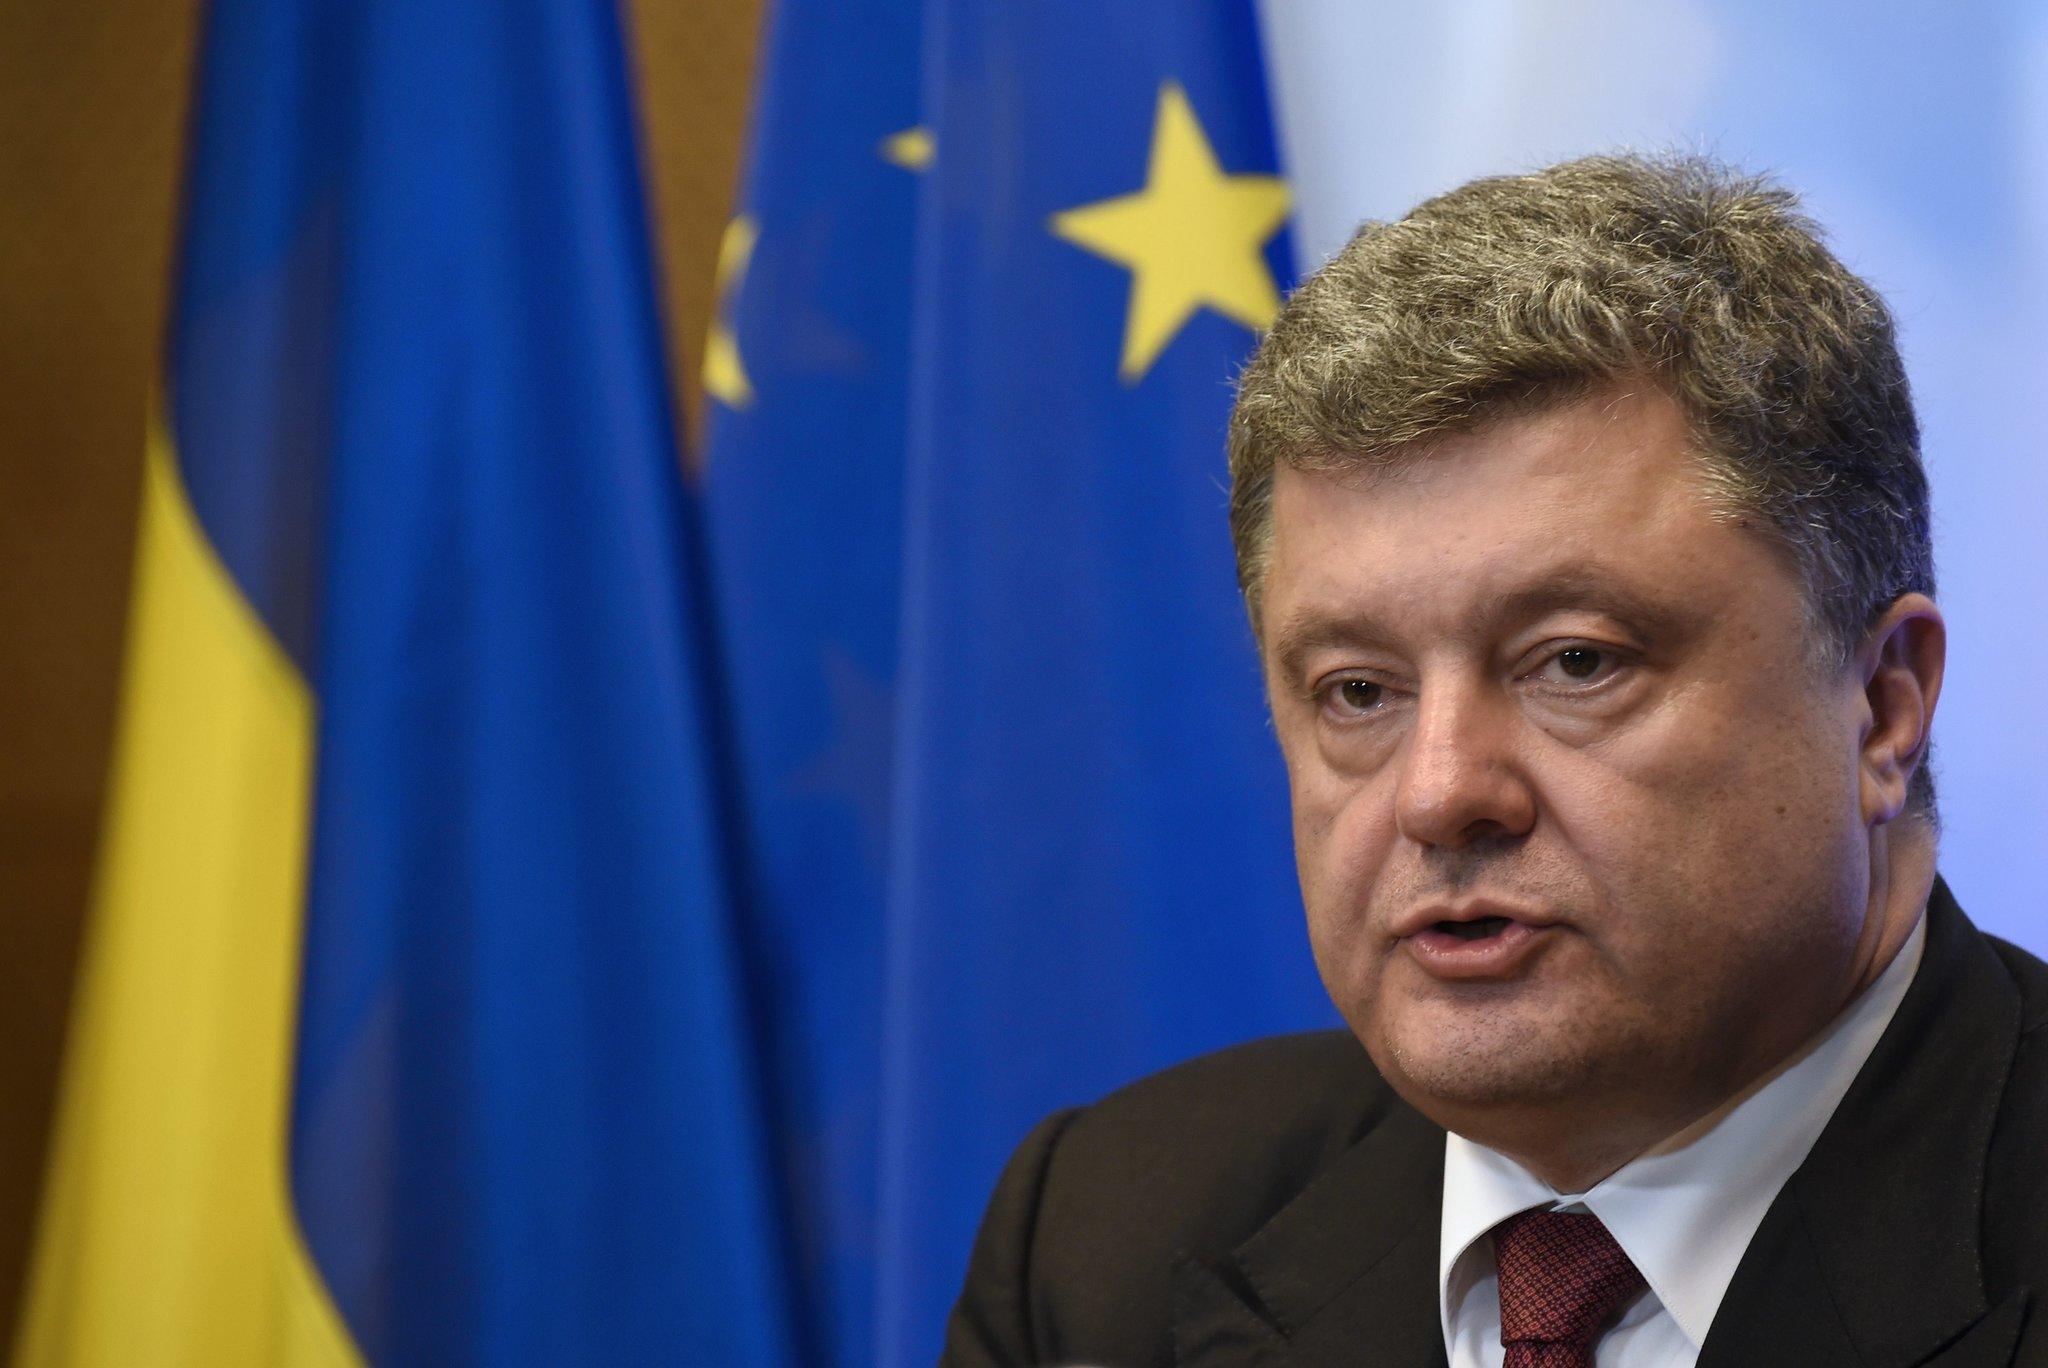 As Ukraine talks resume, Putin and Poroshenko trade barbs